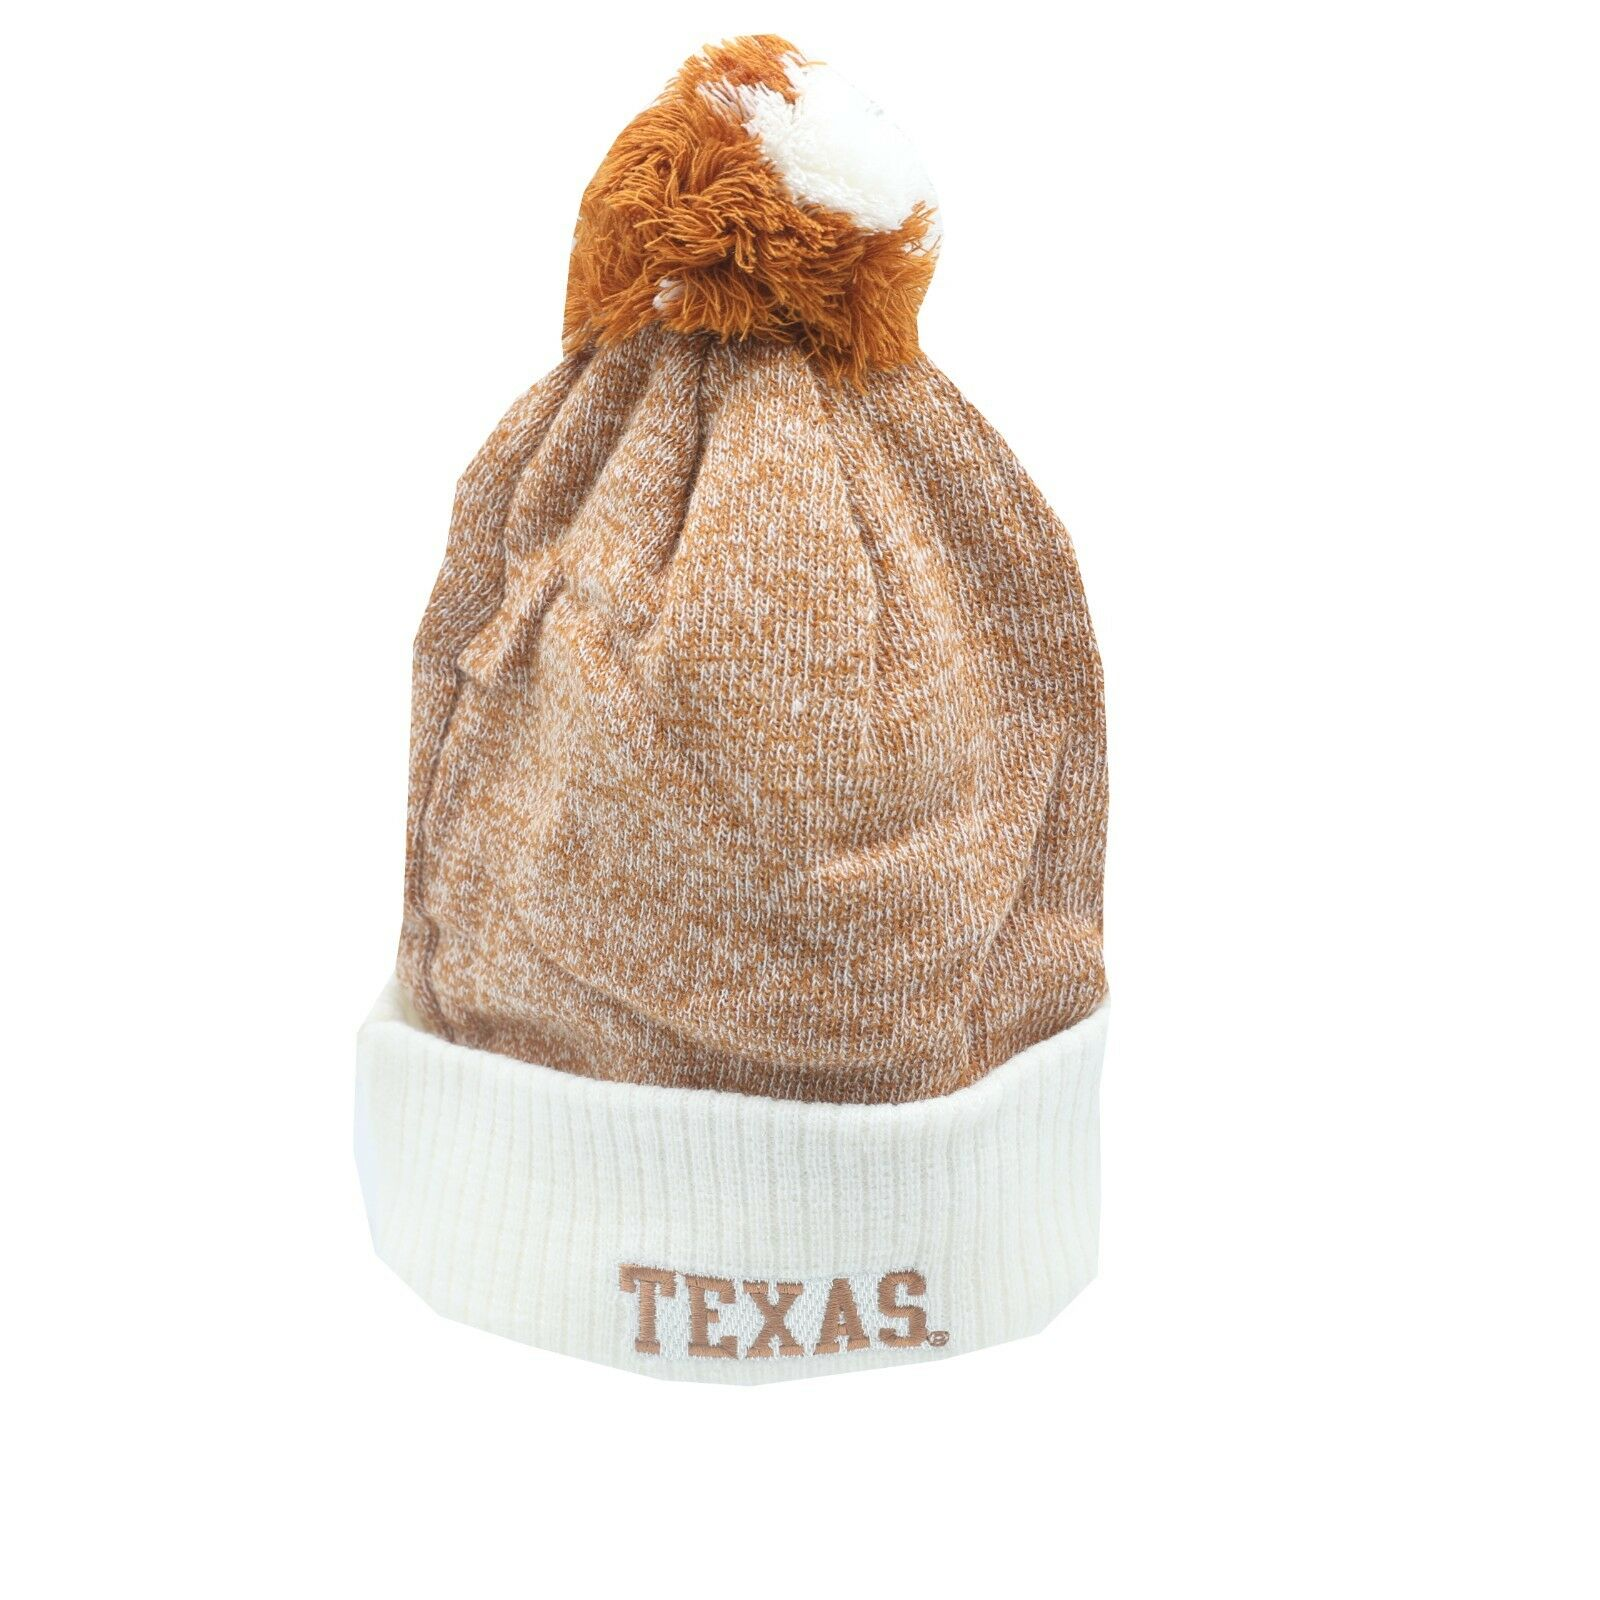 size 40 7108e 64deb Texas Longhorns NCAA Youth Boys (8-20) OSFM Cuffed Winter Pom Knit Beanie  New